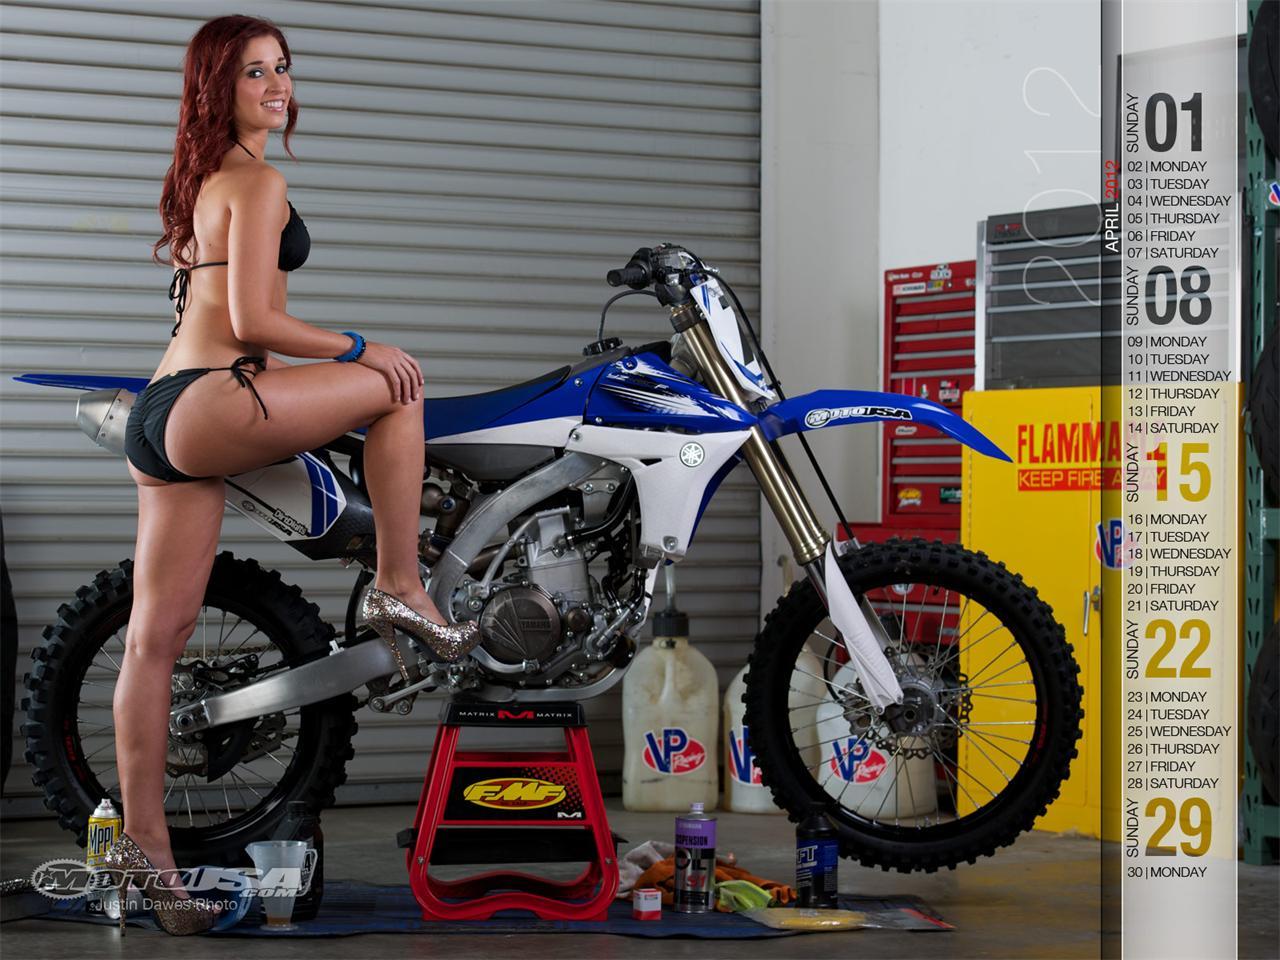 Pin Pin Girl Motocross Below 1280x960